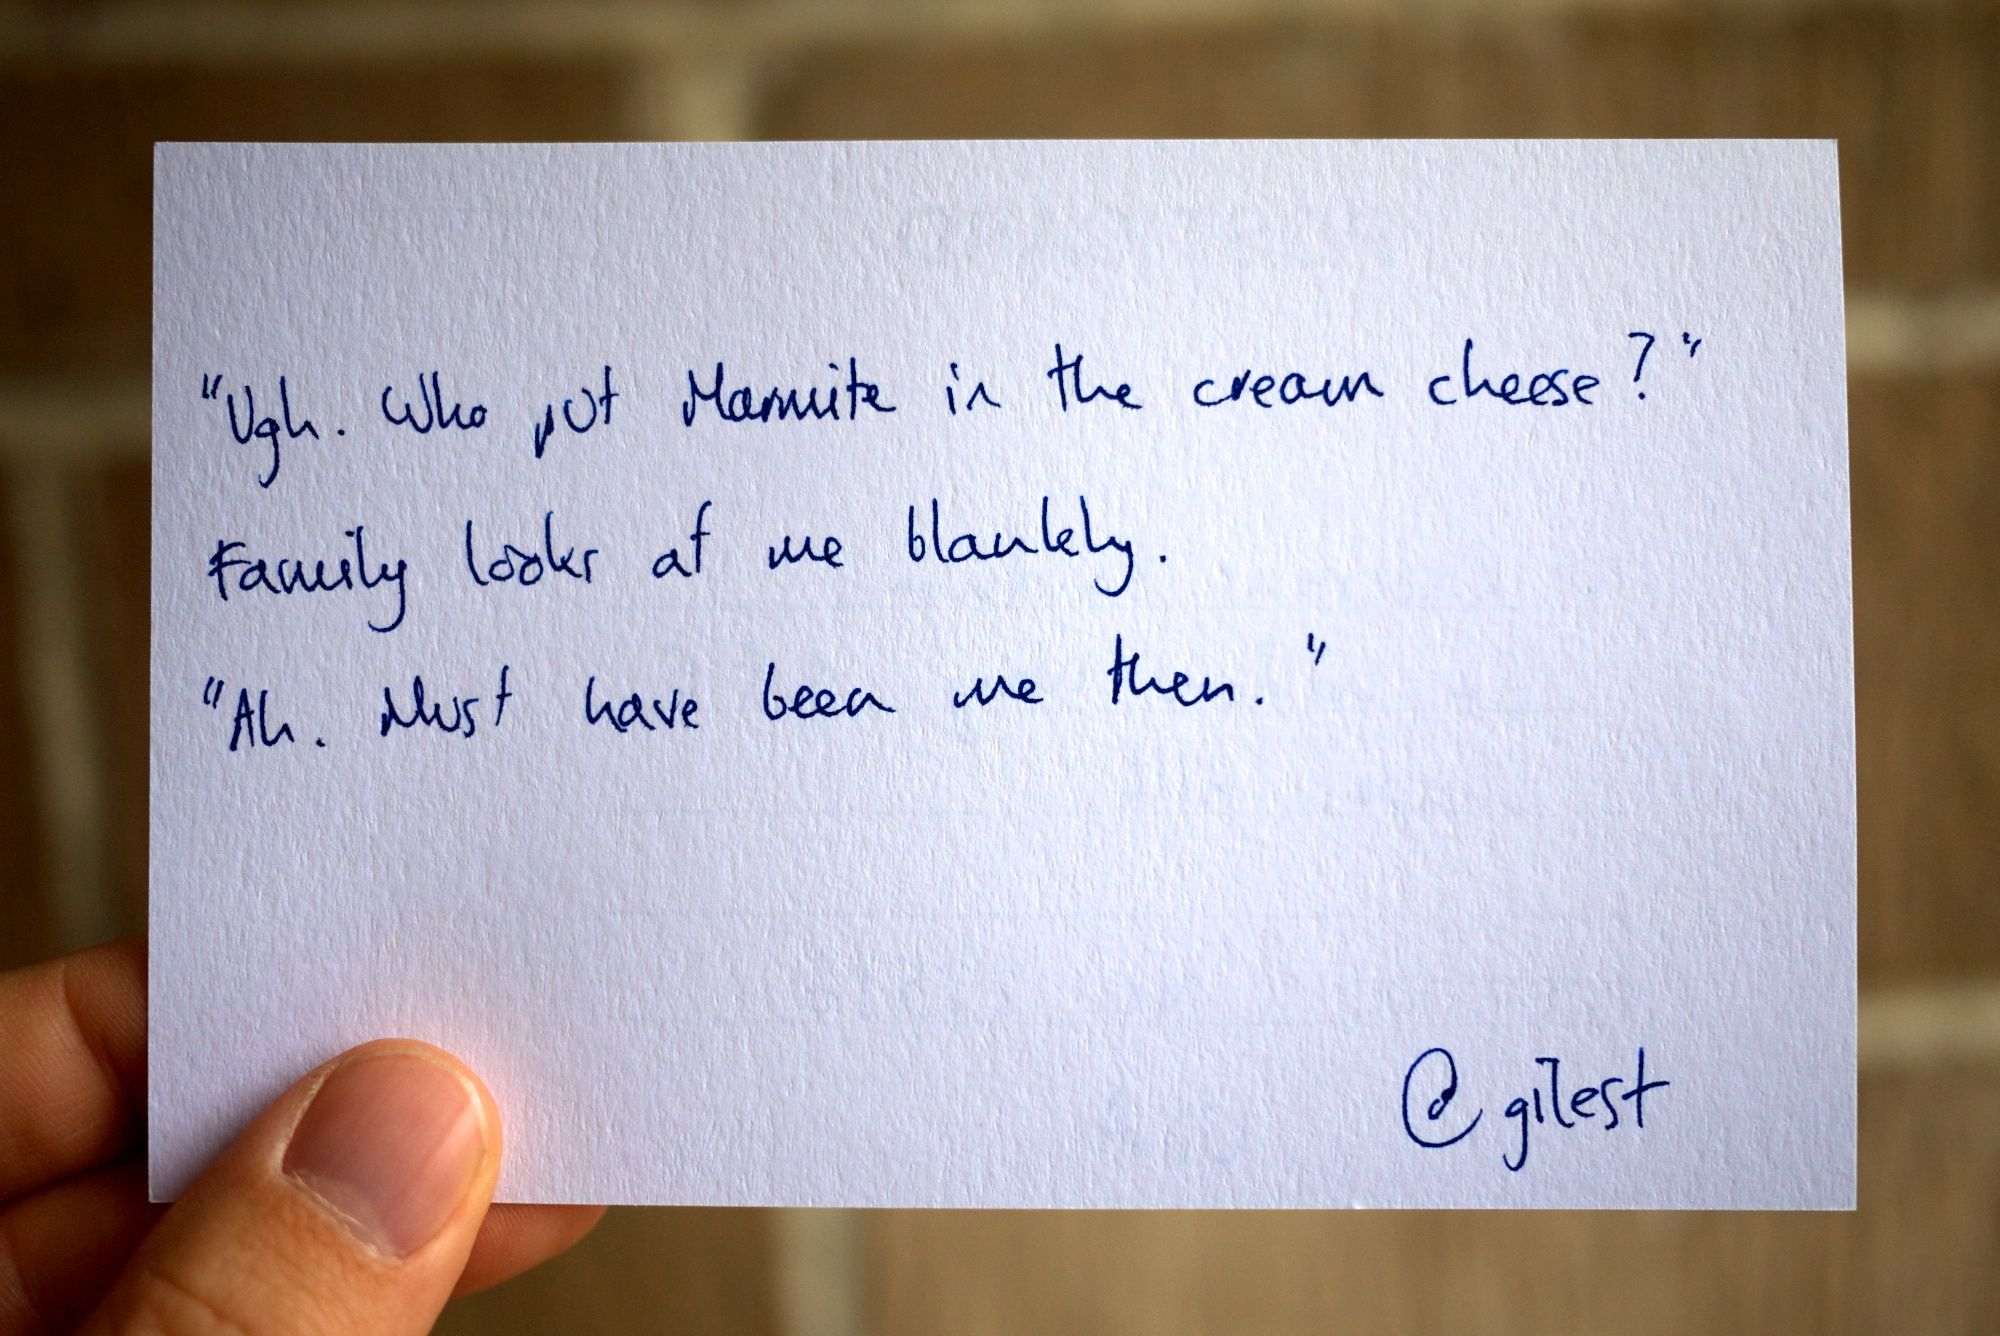 who-put-marmite-in-the-cream-cheese 6556594227 o